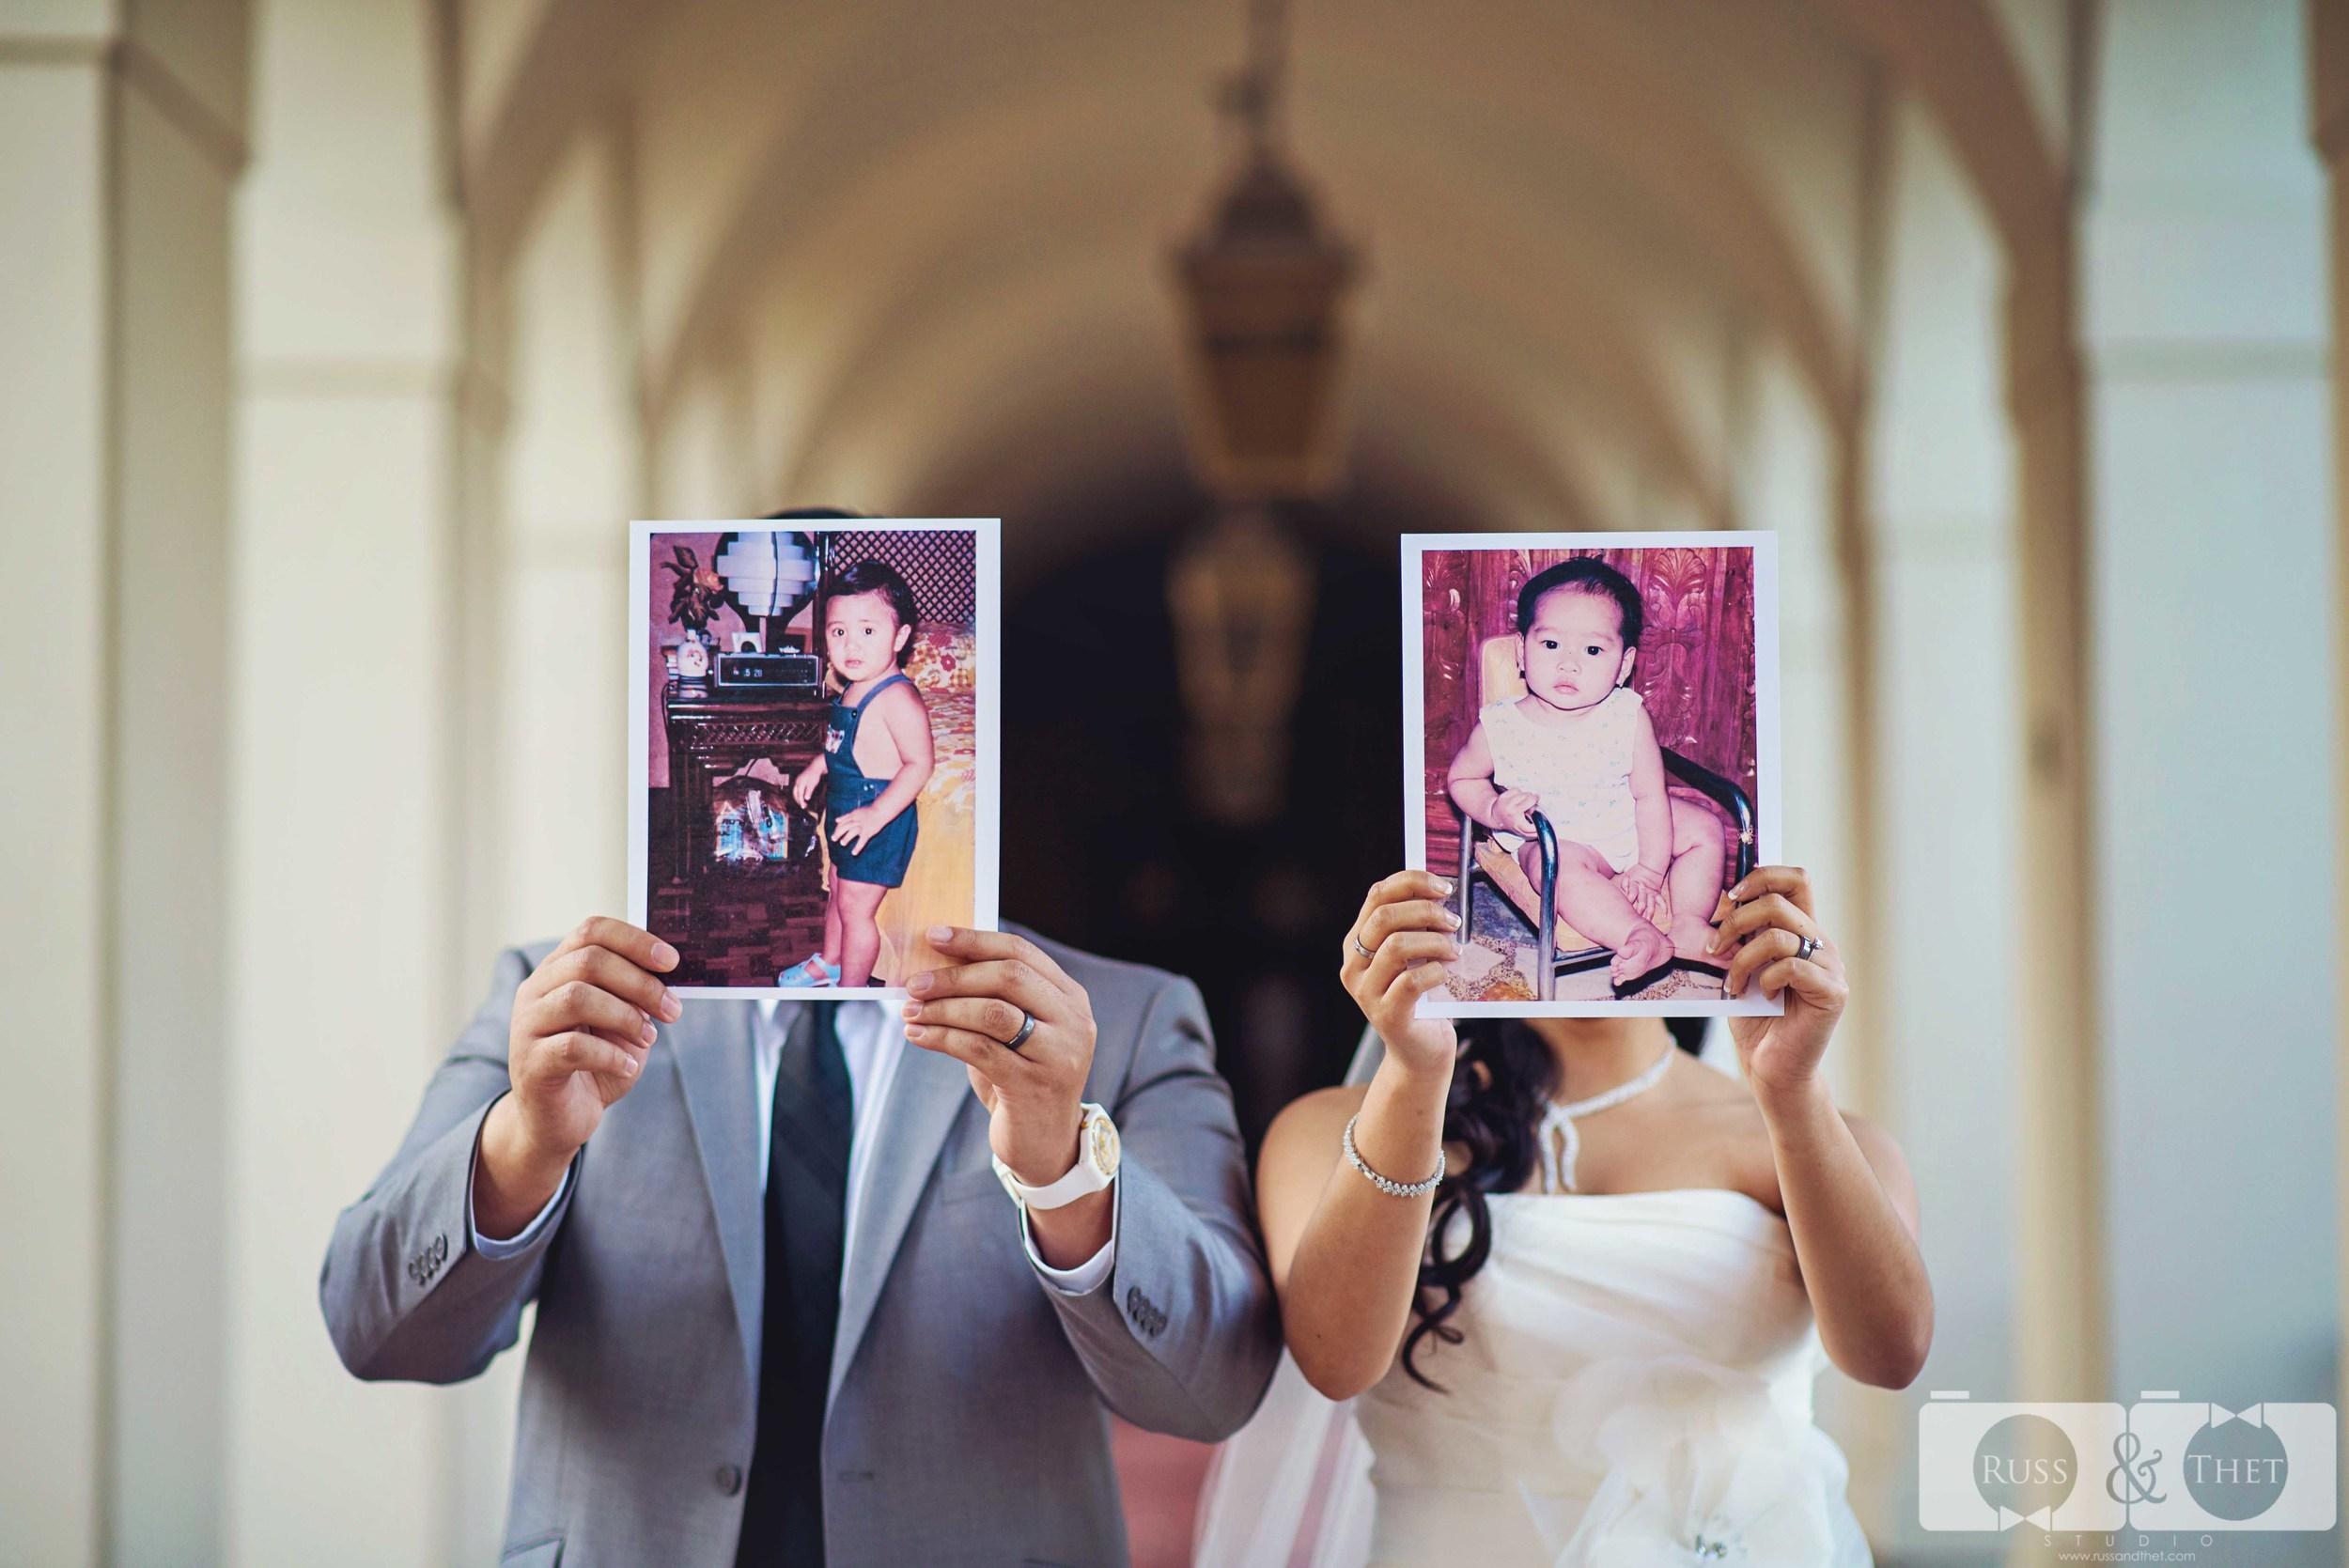 royal-palace-banquet-hall-glendale-wedding-13.JPG